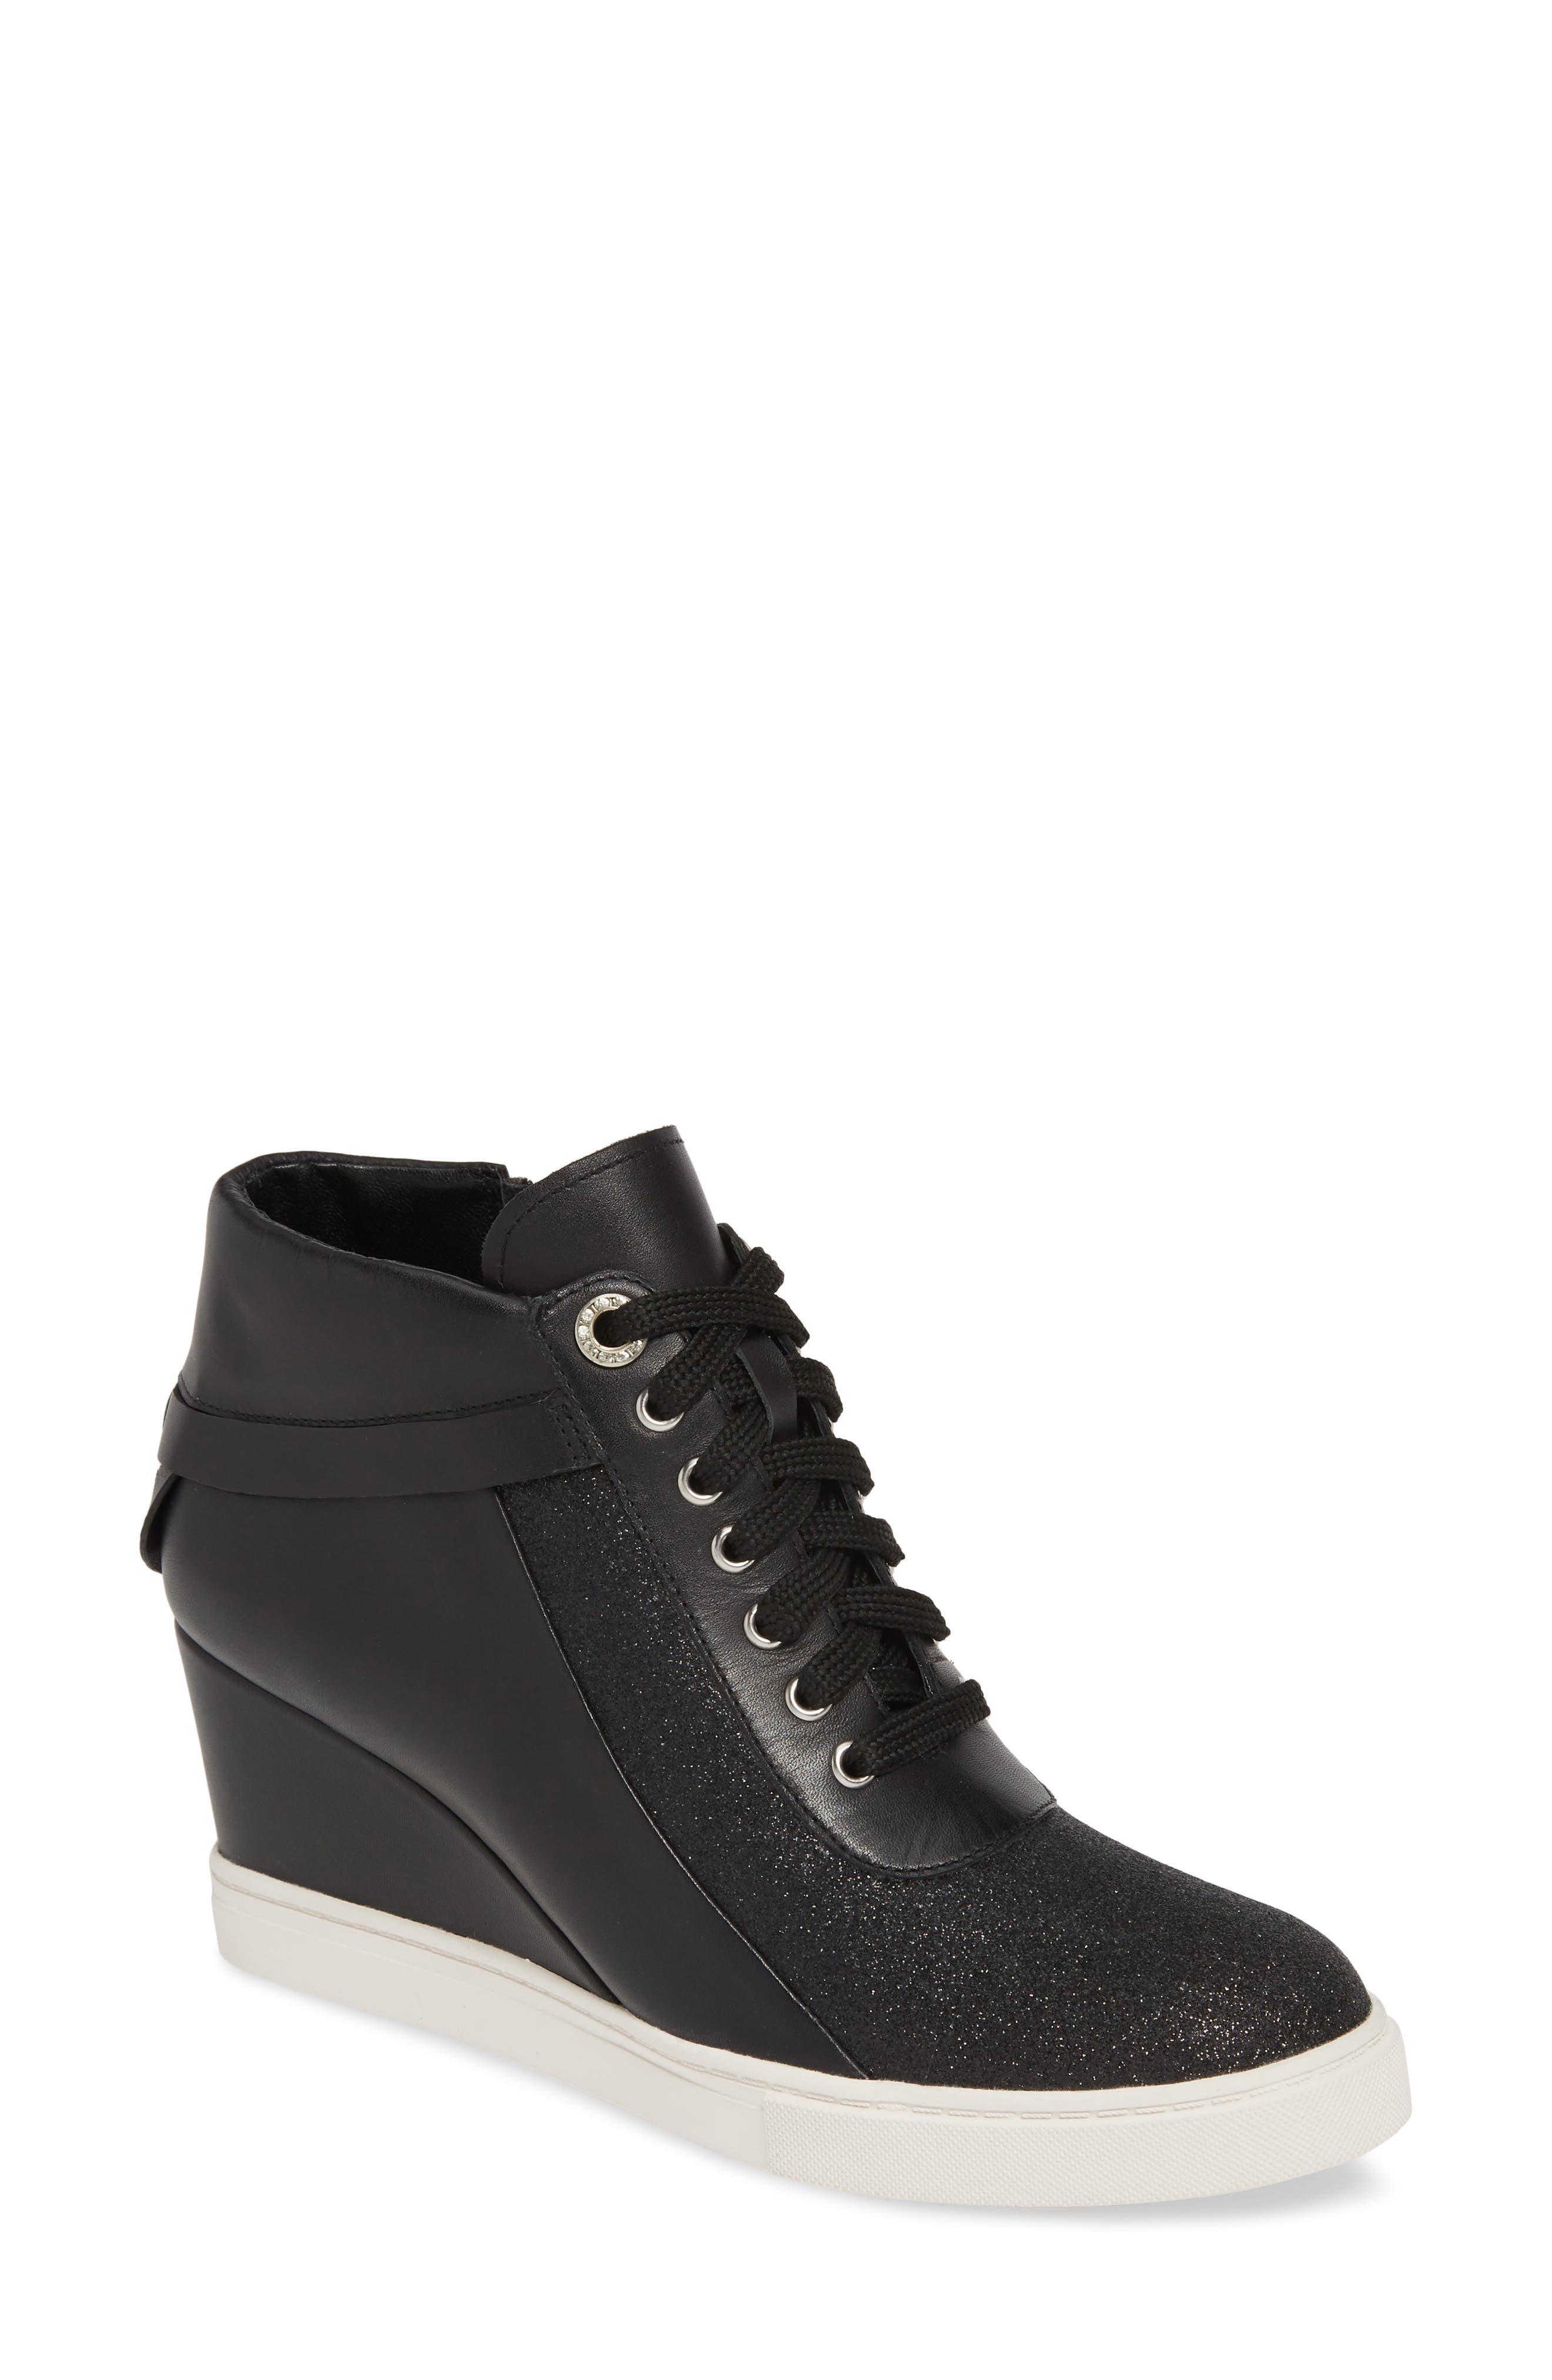 LINEA PAOLO, Freja Wedge Sneaker, Main thumbnail 1, color, BLACK GLISTEN LEATHER